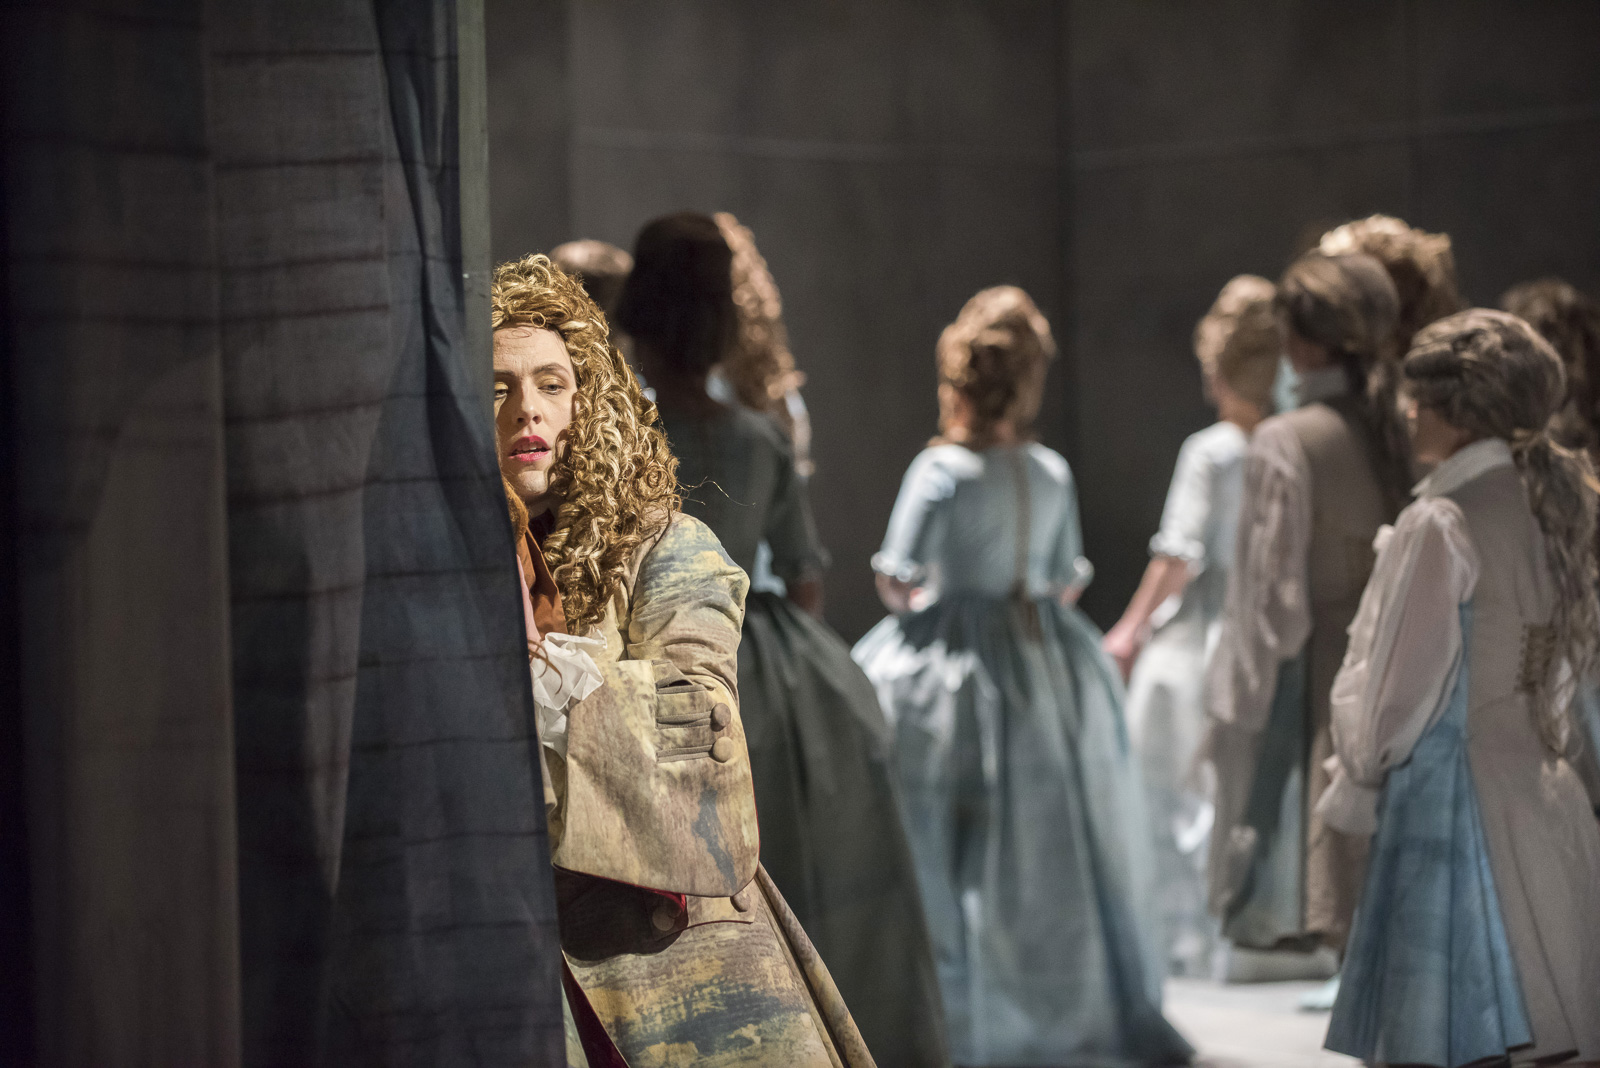 OPÉRA LIVE : ARSILDA, REGINA DI PONTO DE VIVALDI AVEC L'ENSEMBLE TCHÈQUE COLLEGIUM VOCALE 1704